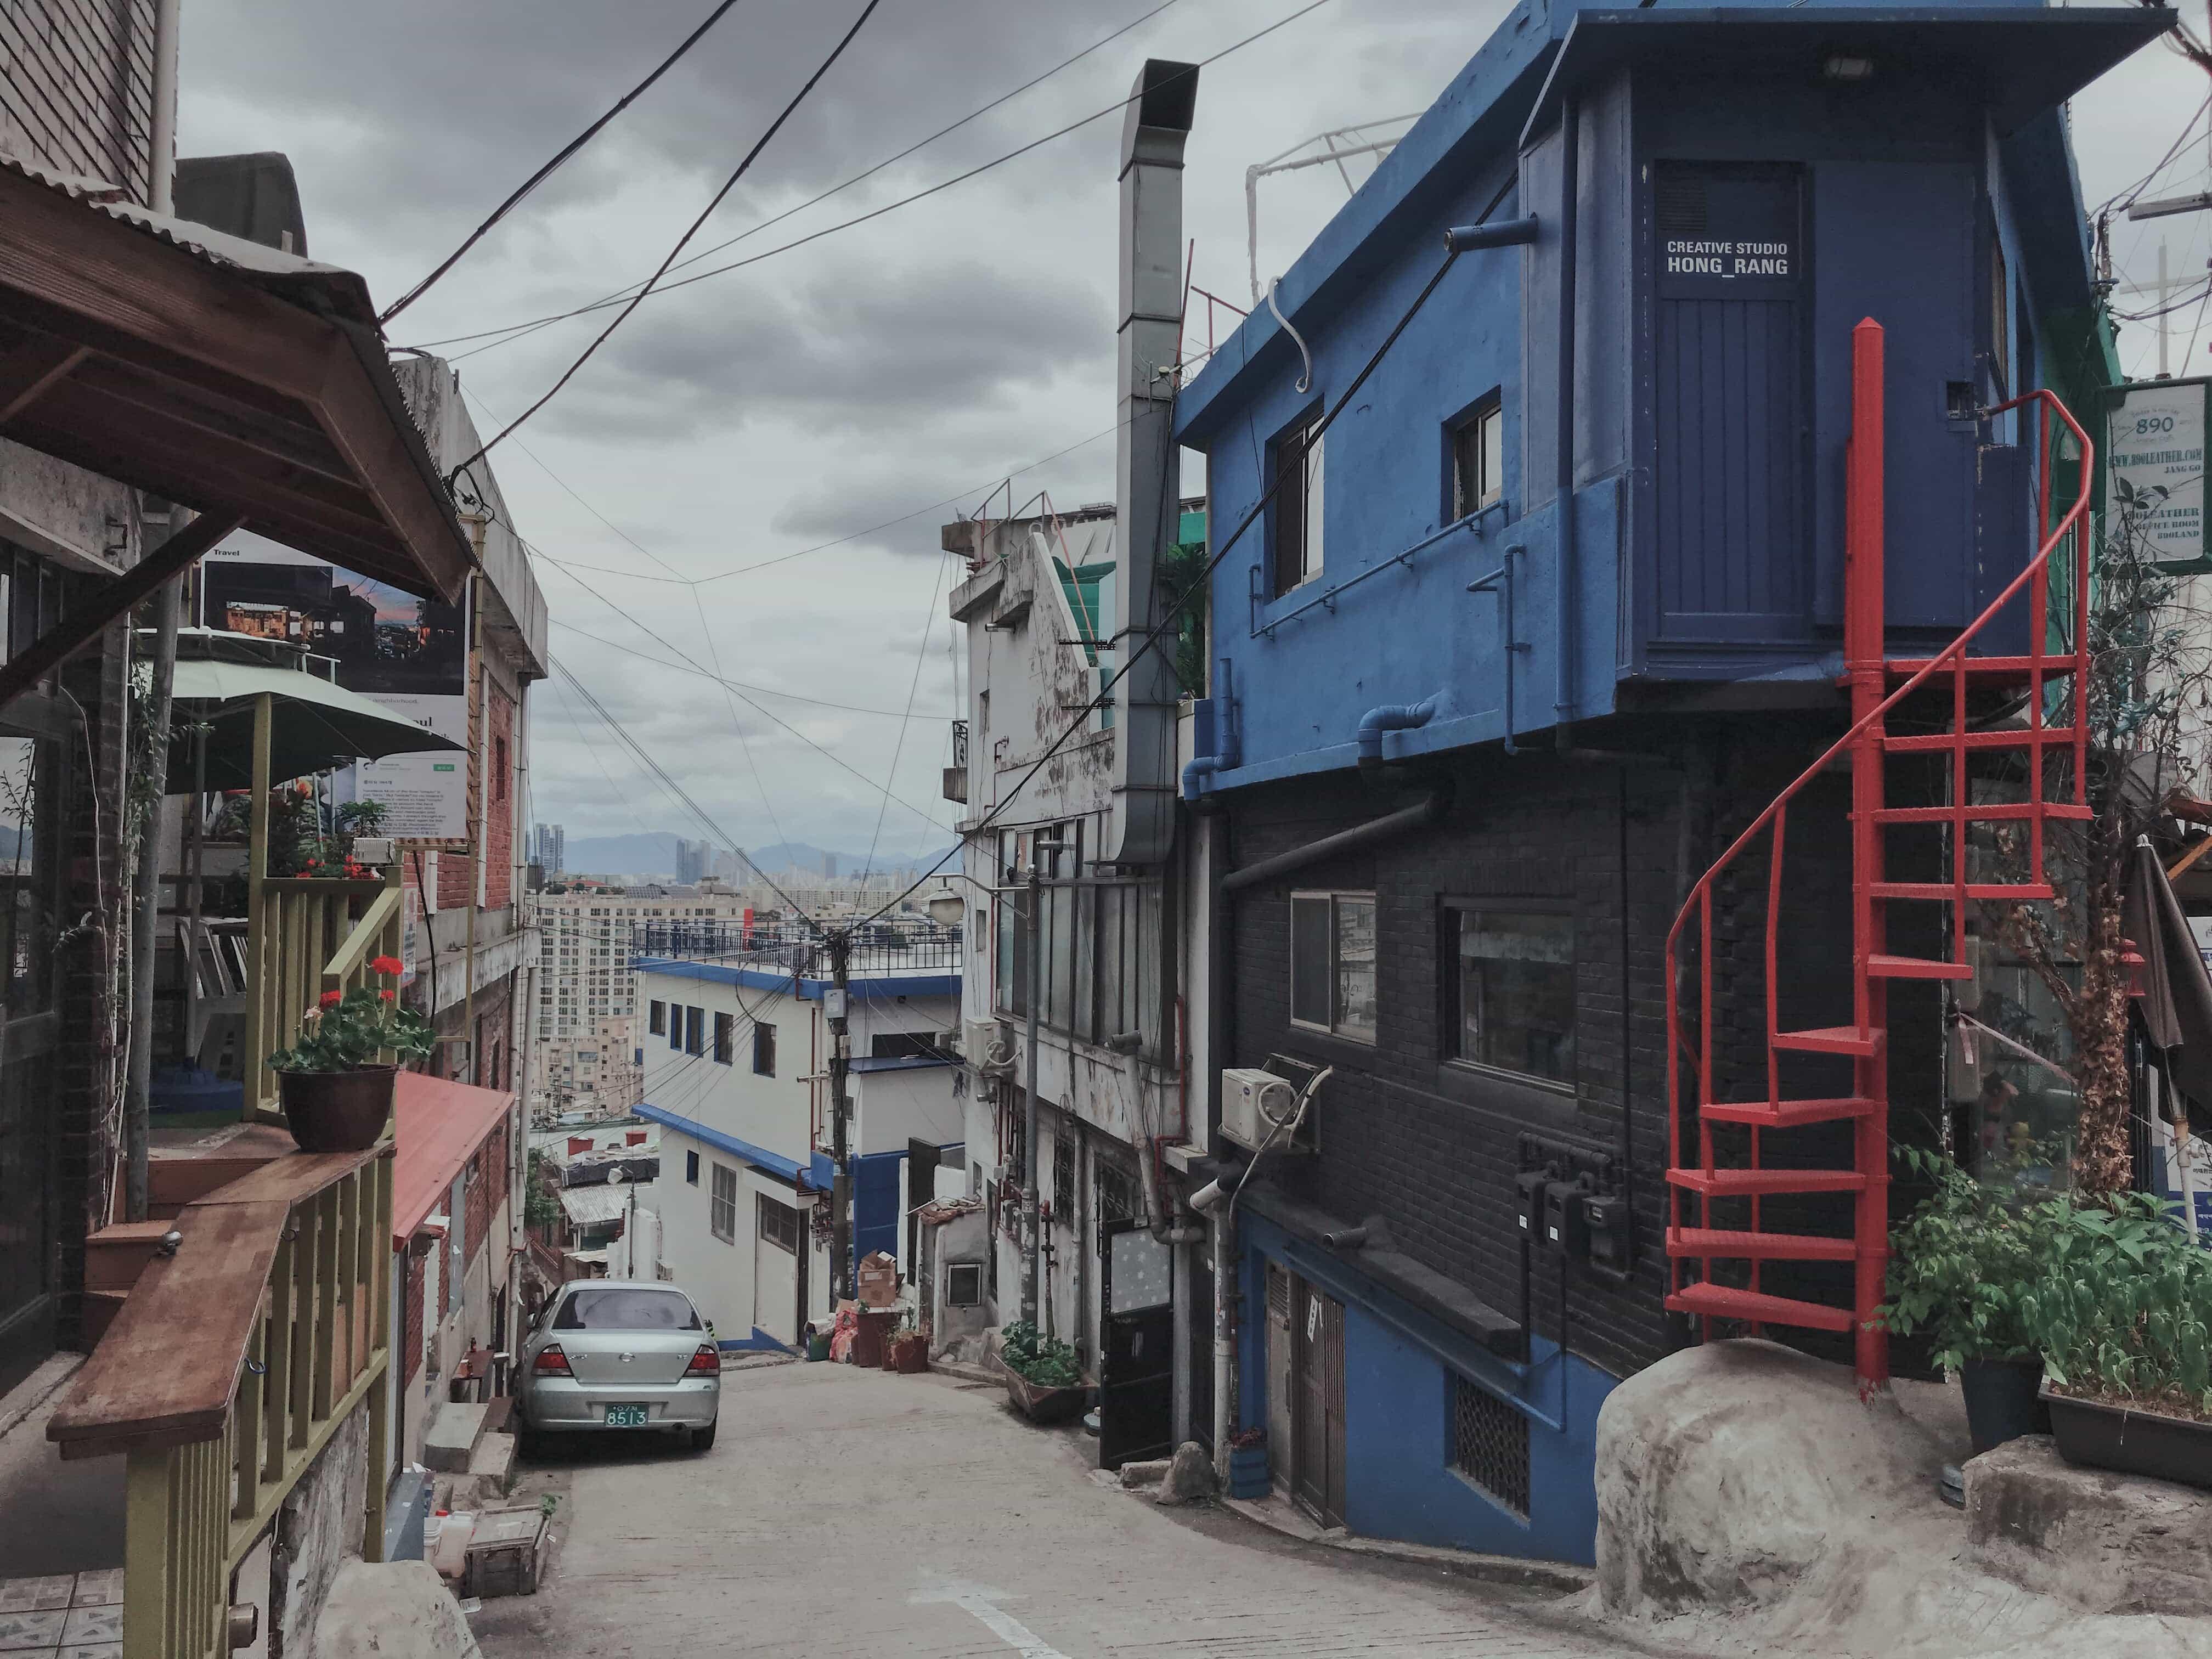 Asian street